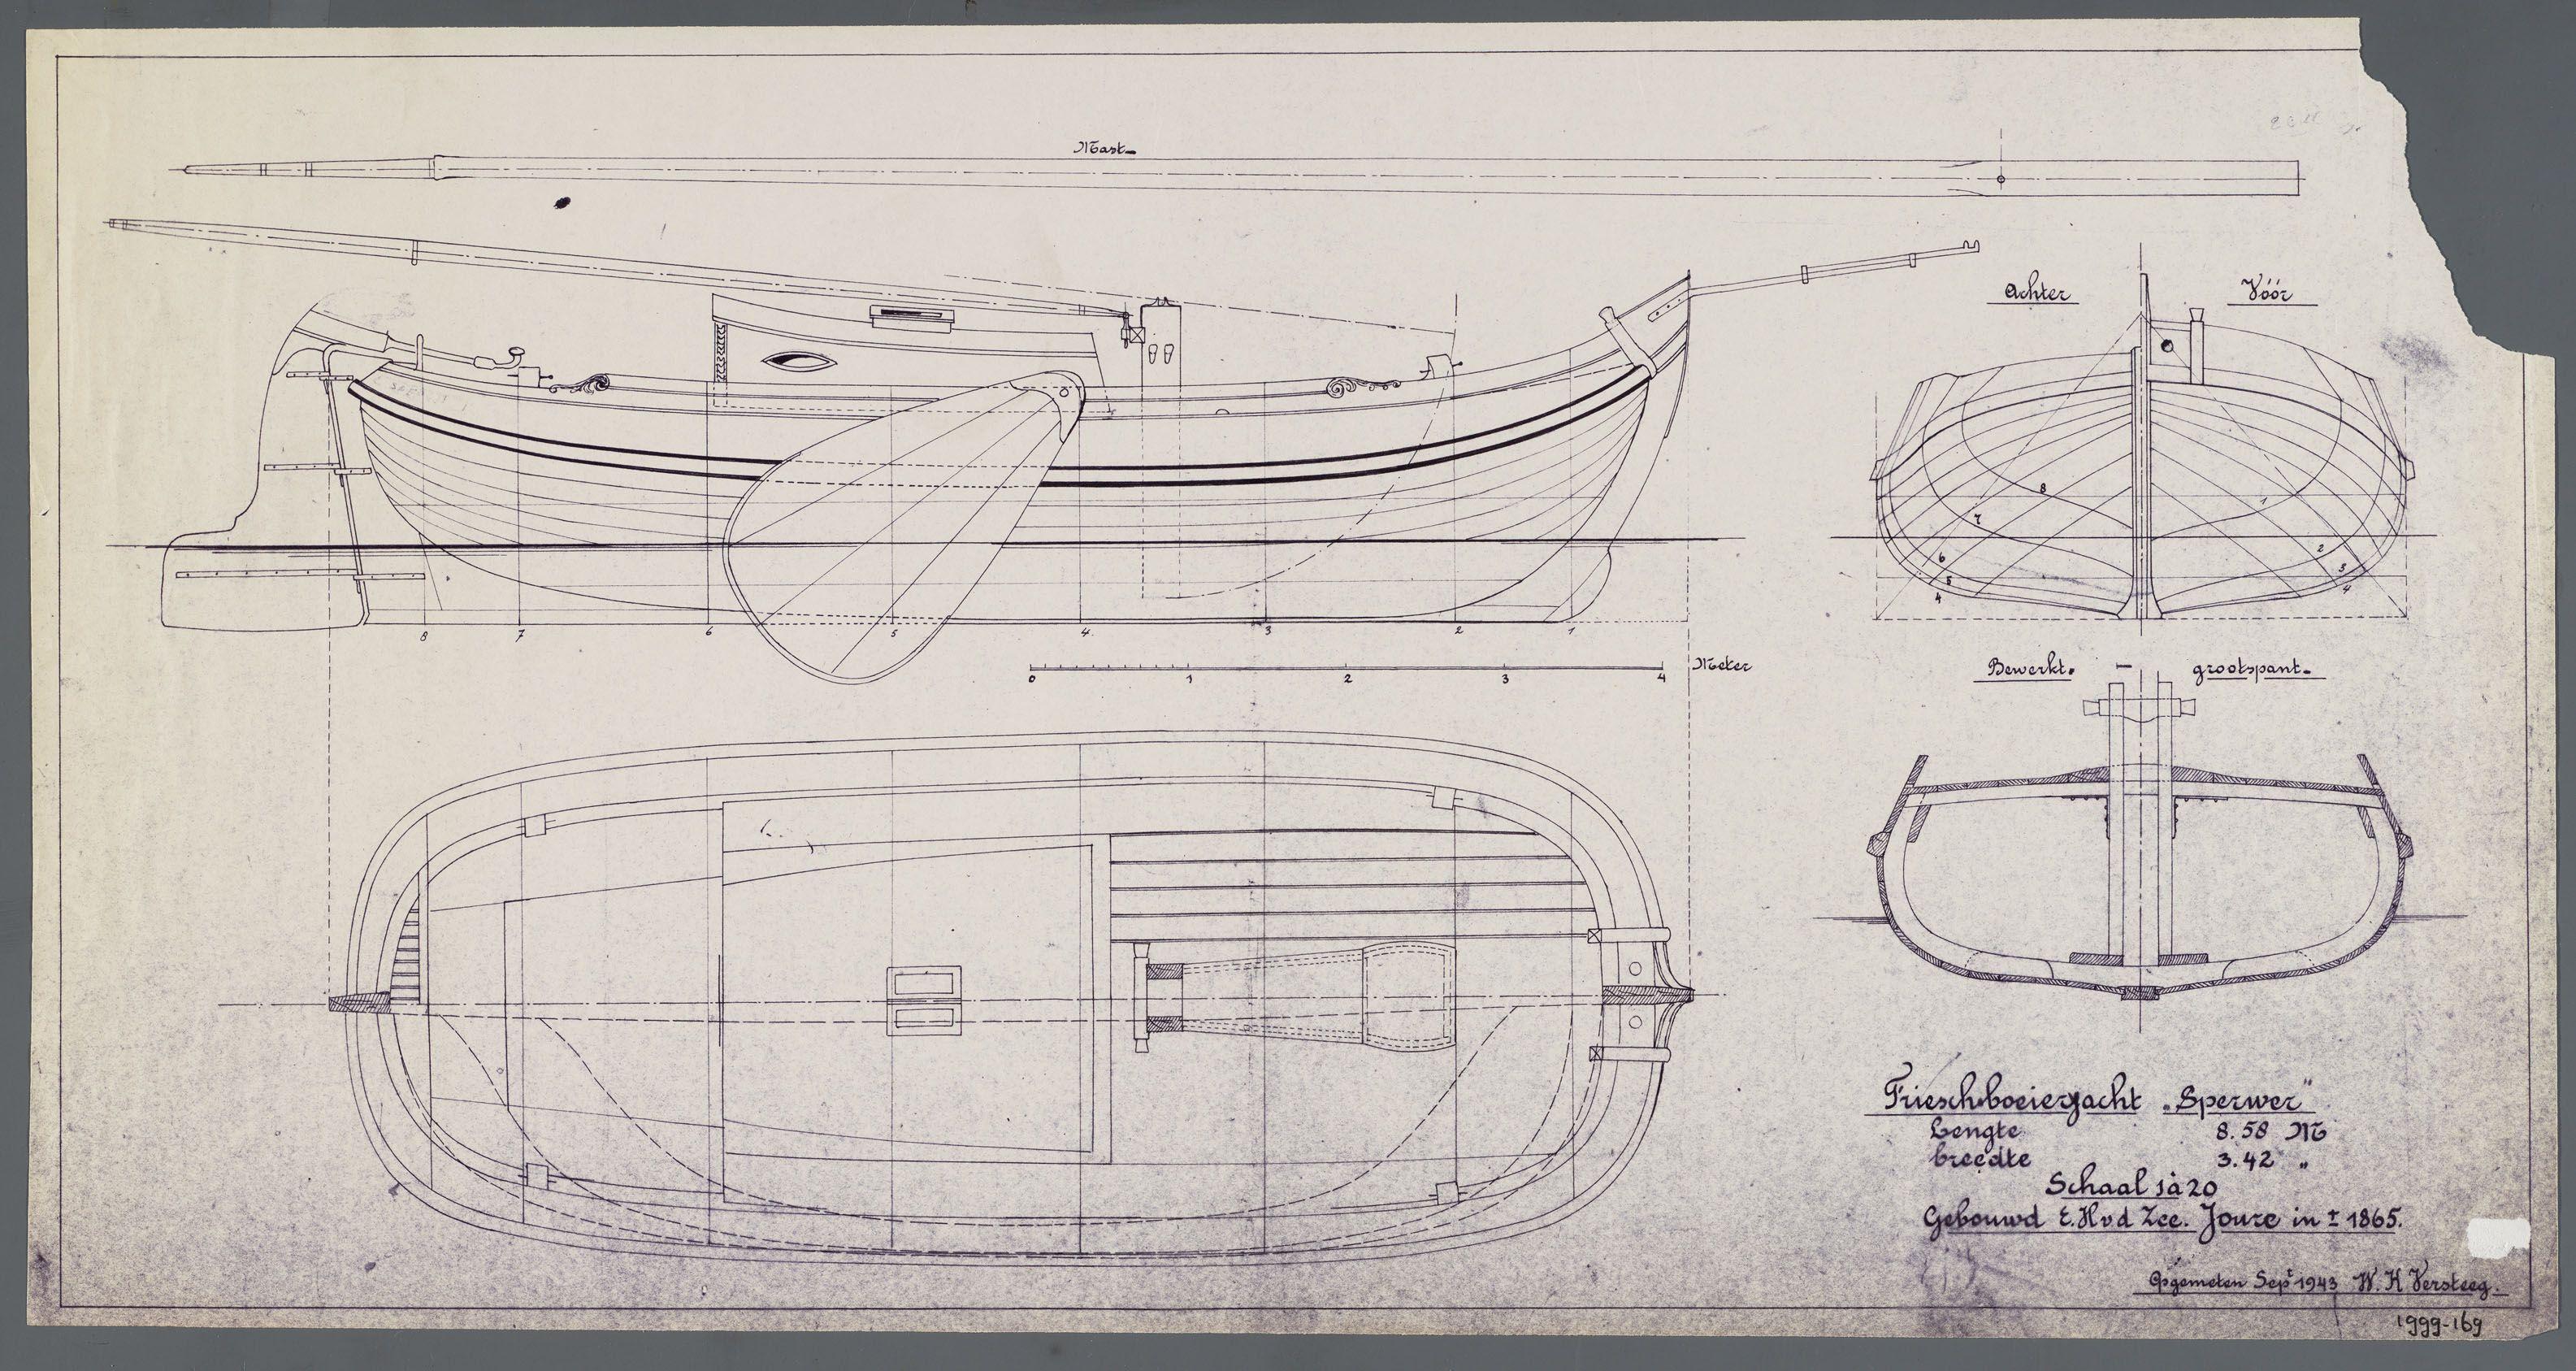 boeier - Google Search | Ships & Sails in 2019 | Sailboat plans, Wooden boat plans, Boat plans